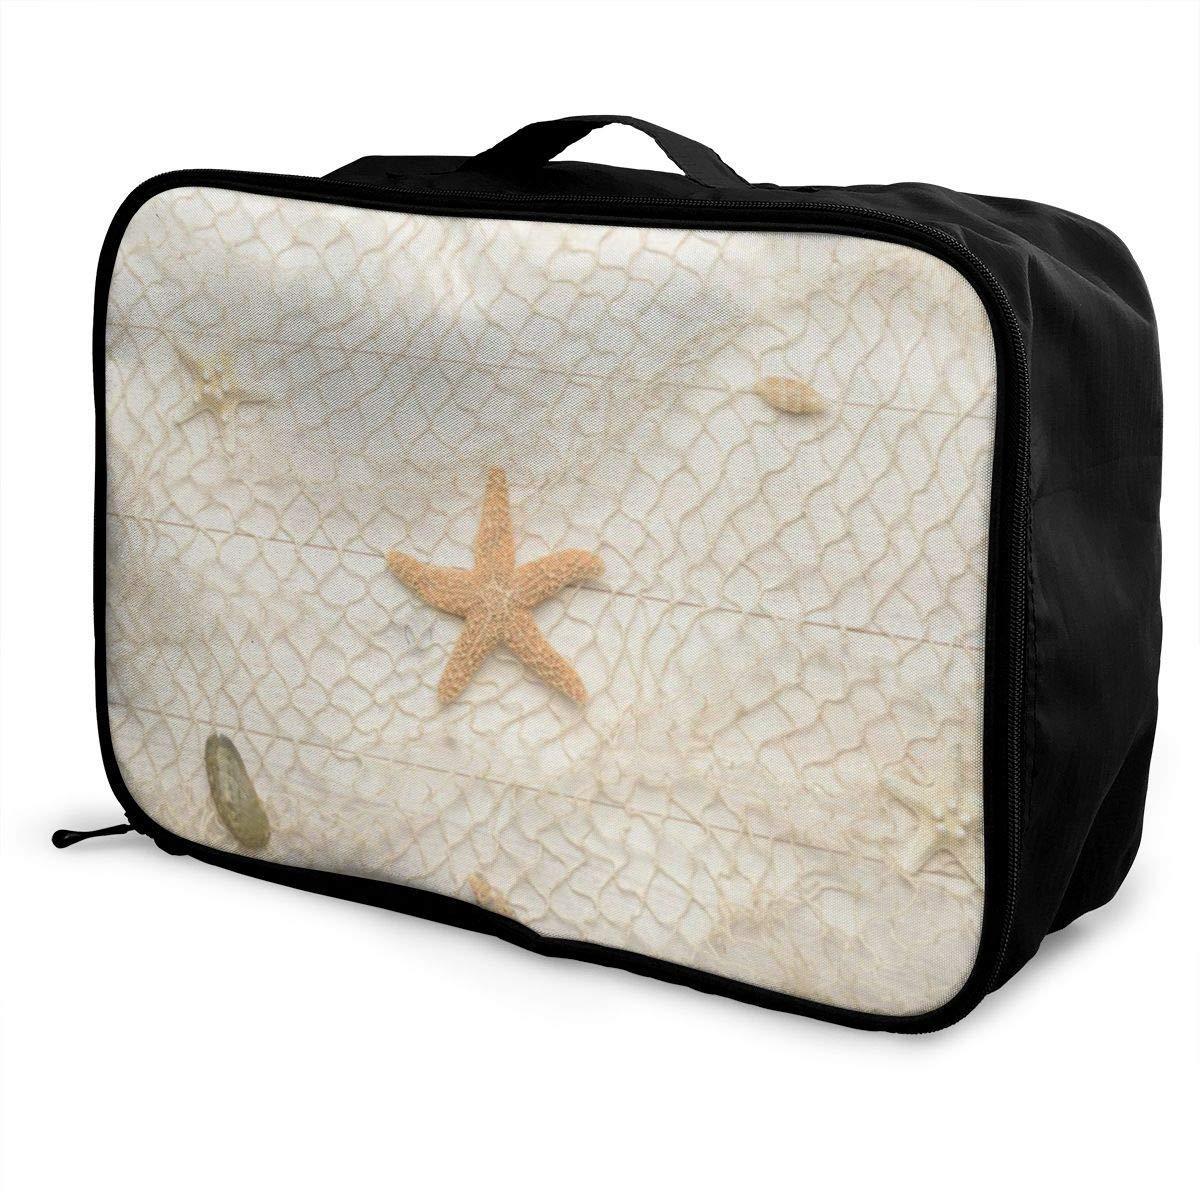 Travel Bags Seashell Starfish Portable Duffel Trolley Handle Luggage Bag